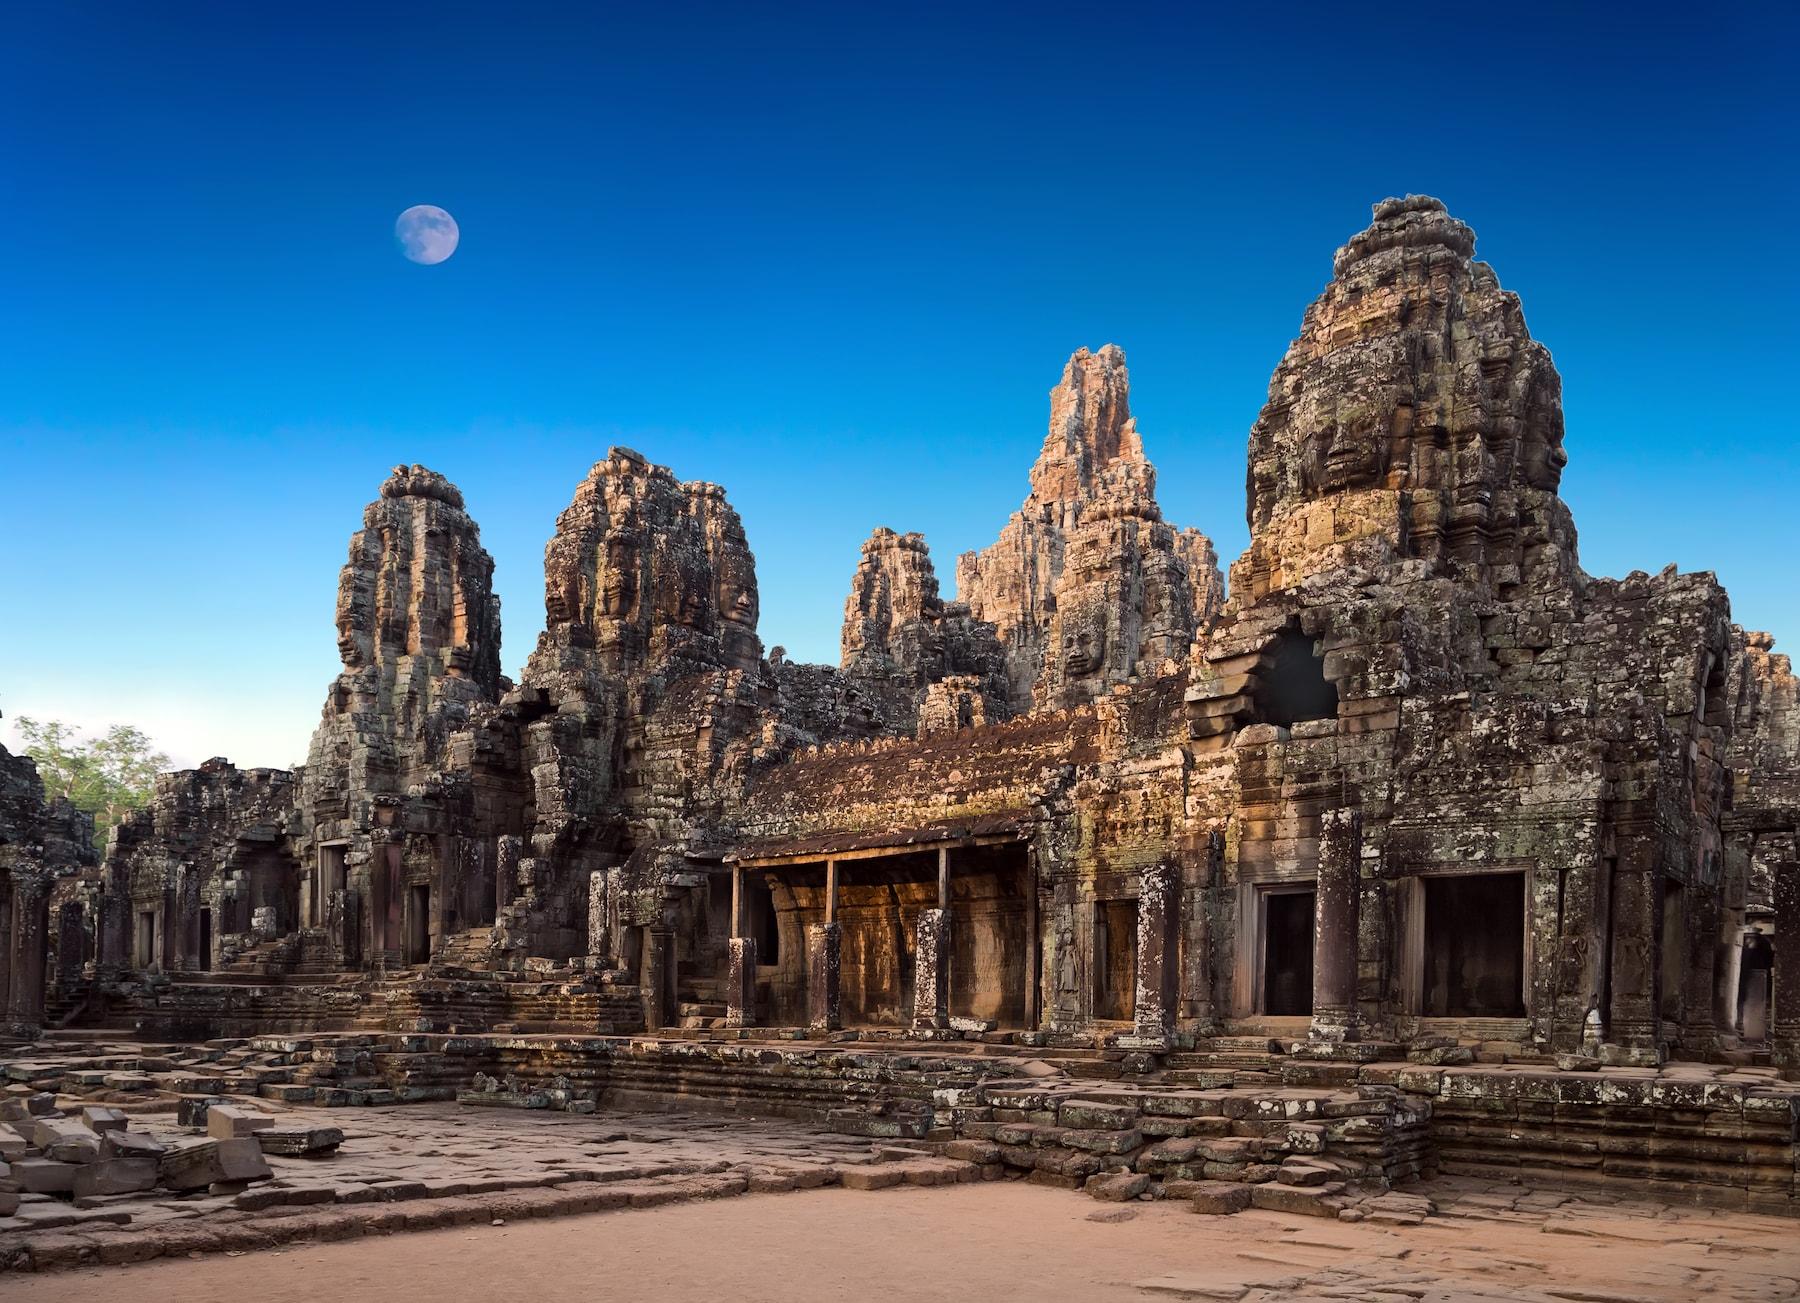 World's oldest cities: Angkor Wat